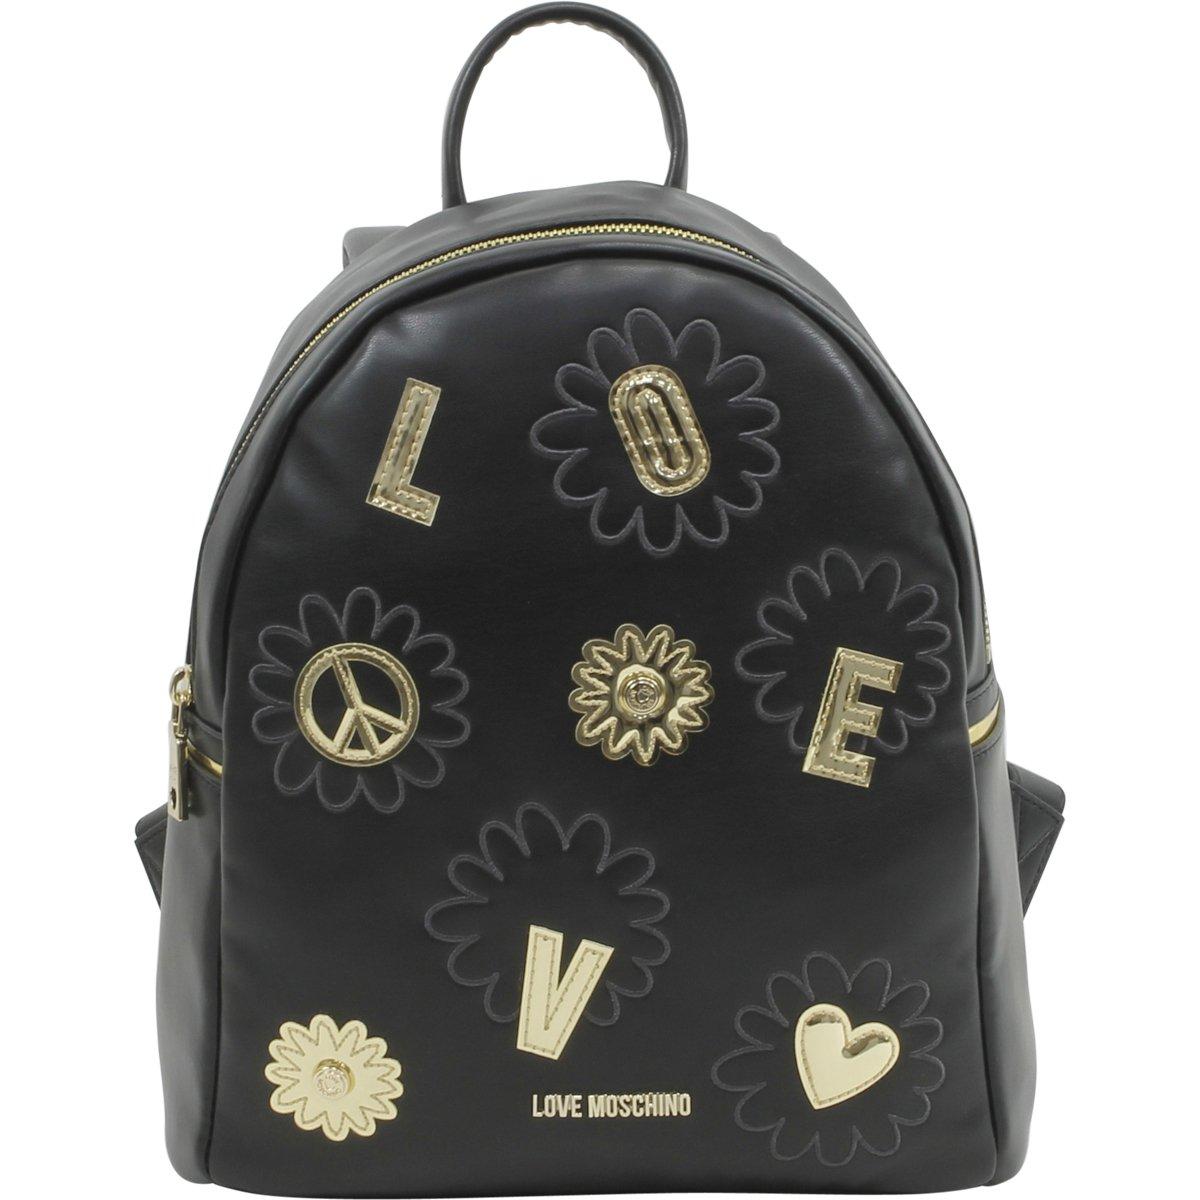 LOVE Moschino Women's Flower Love Backpack Black Backpack